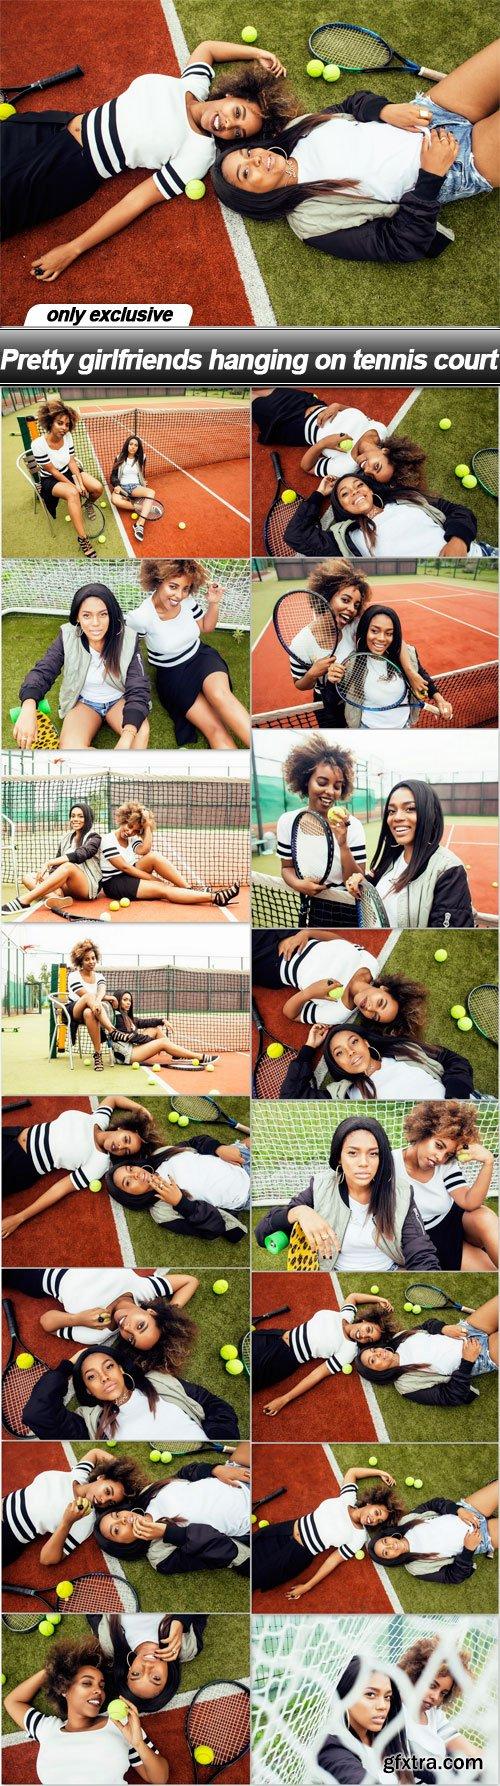 Pretty girlfriends hanging on tennis court - 16 UHQ JPEG